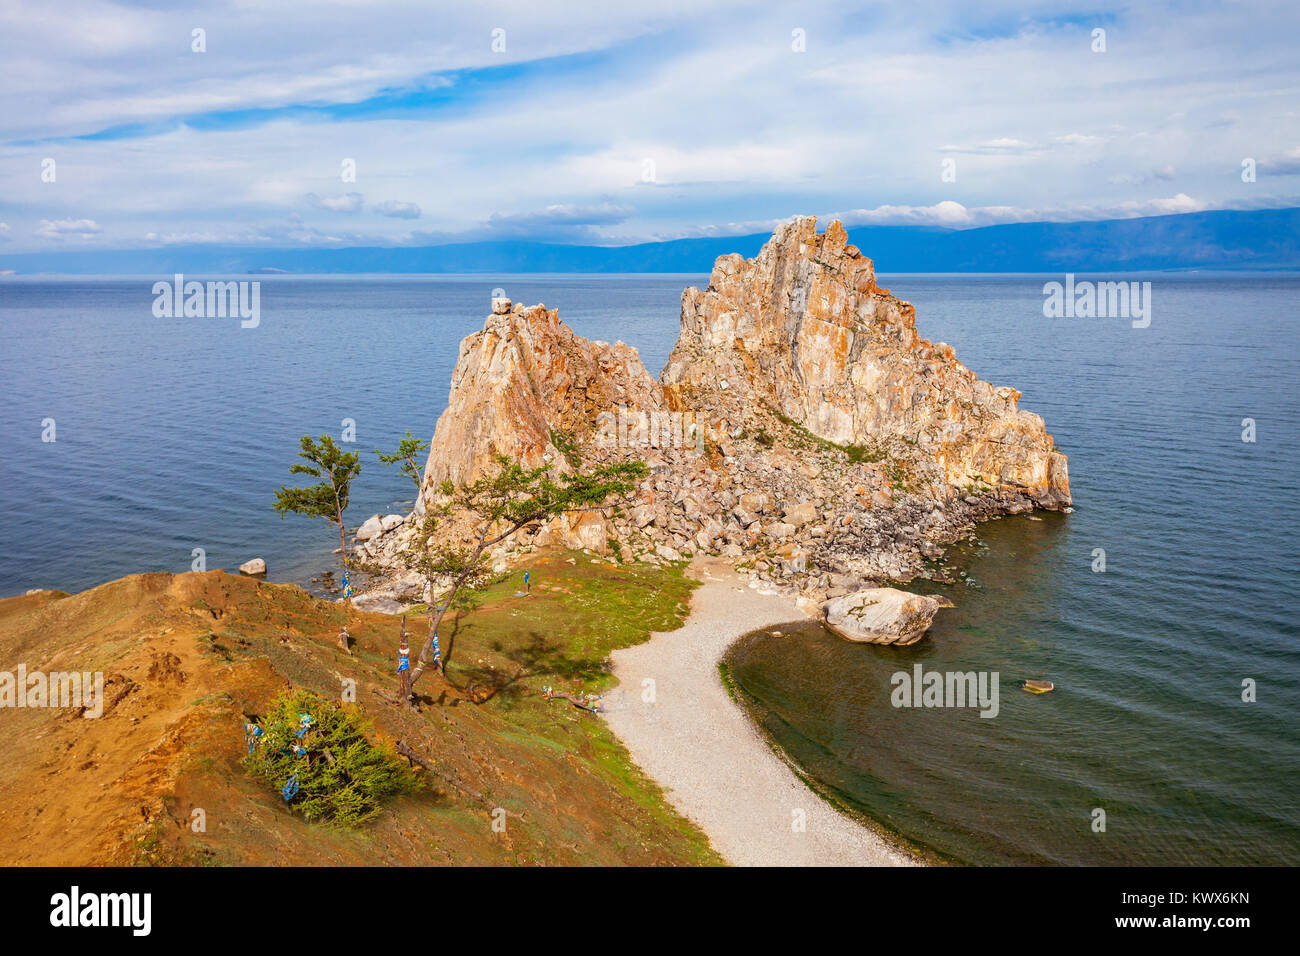 Shamanka (Shamans Rock) on Baikal lake near Khuzhir at Olkhon island in Siberia, Russia. Lake Baikal is the largest - Stock Image